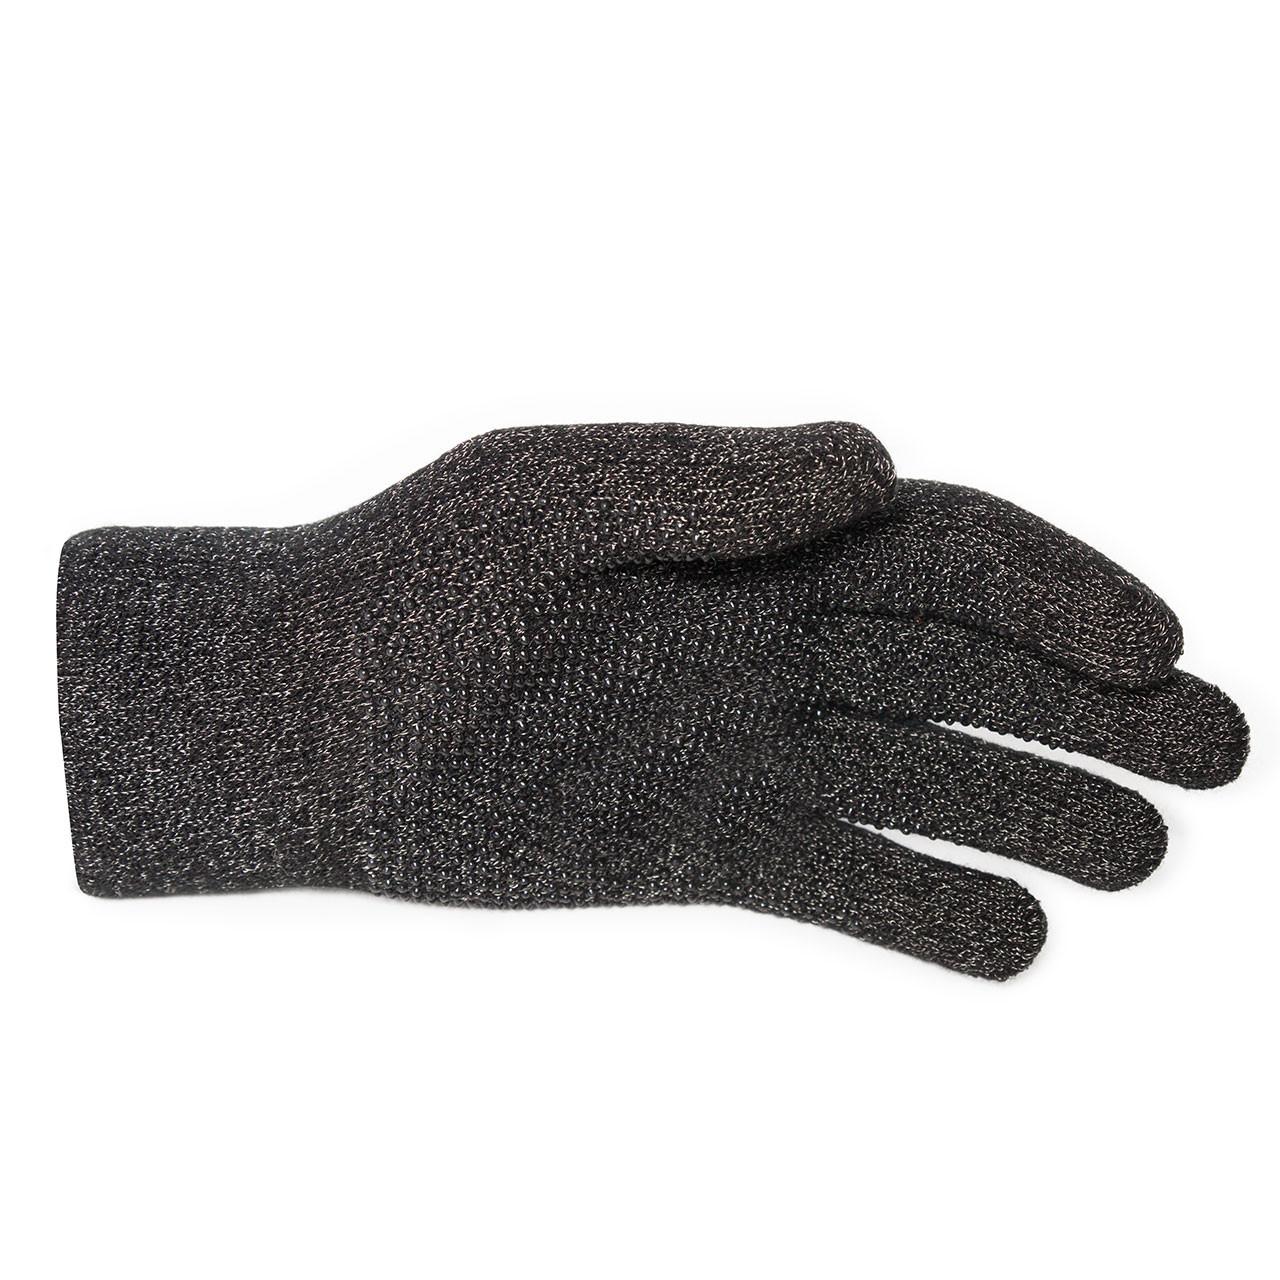 Agloves Polar Sport Black grip